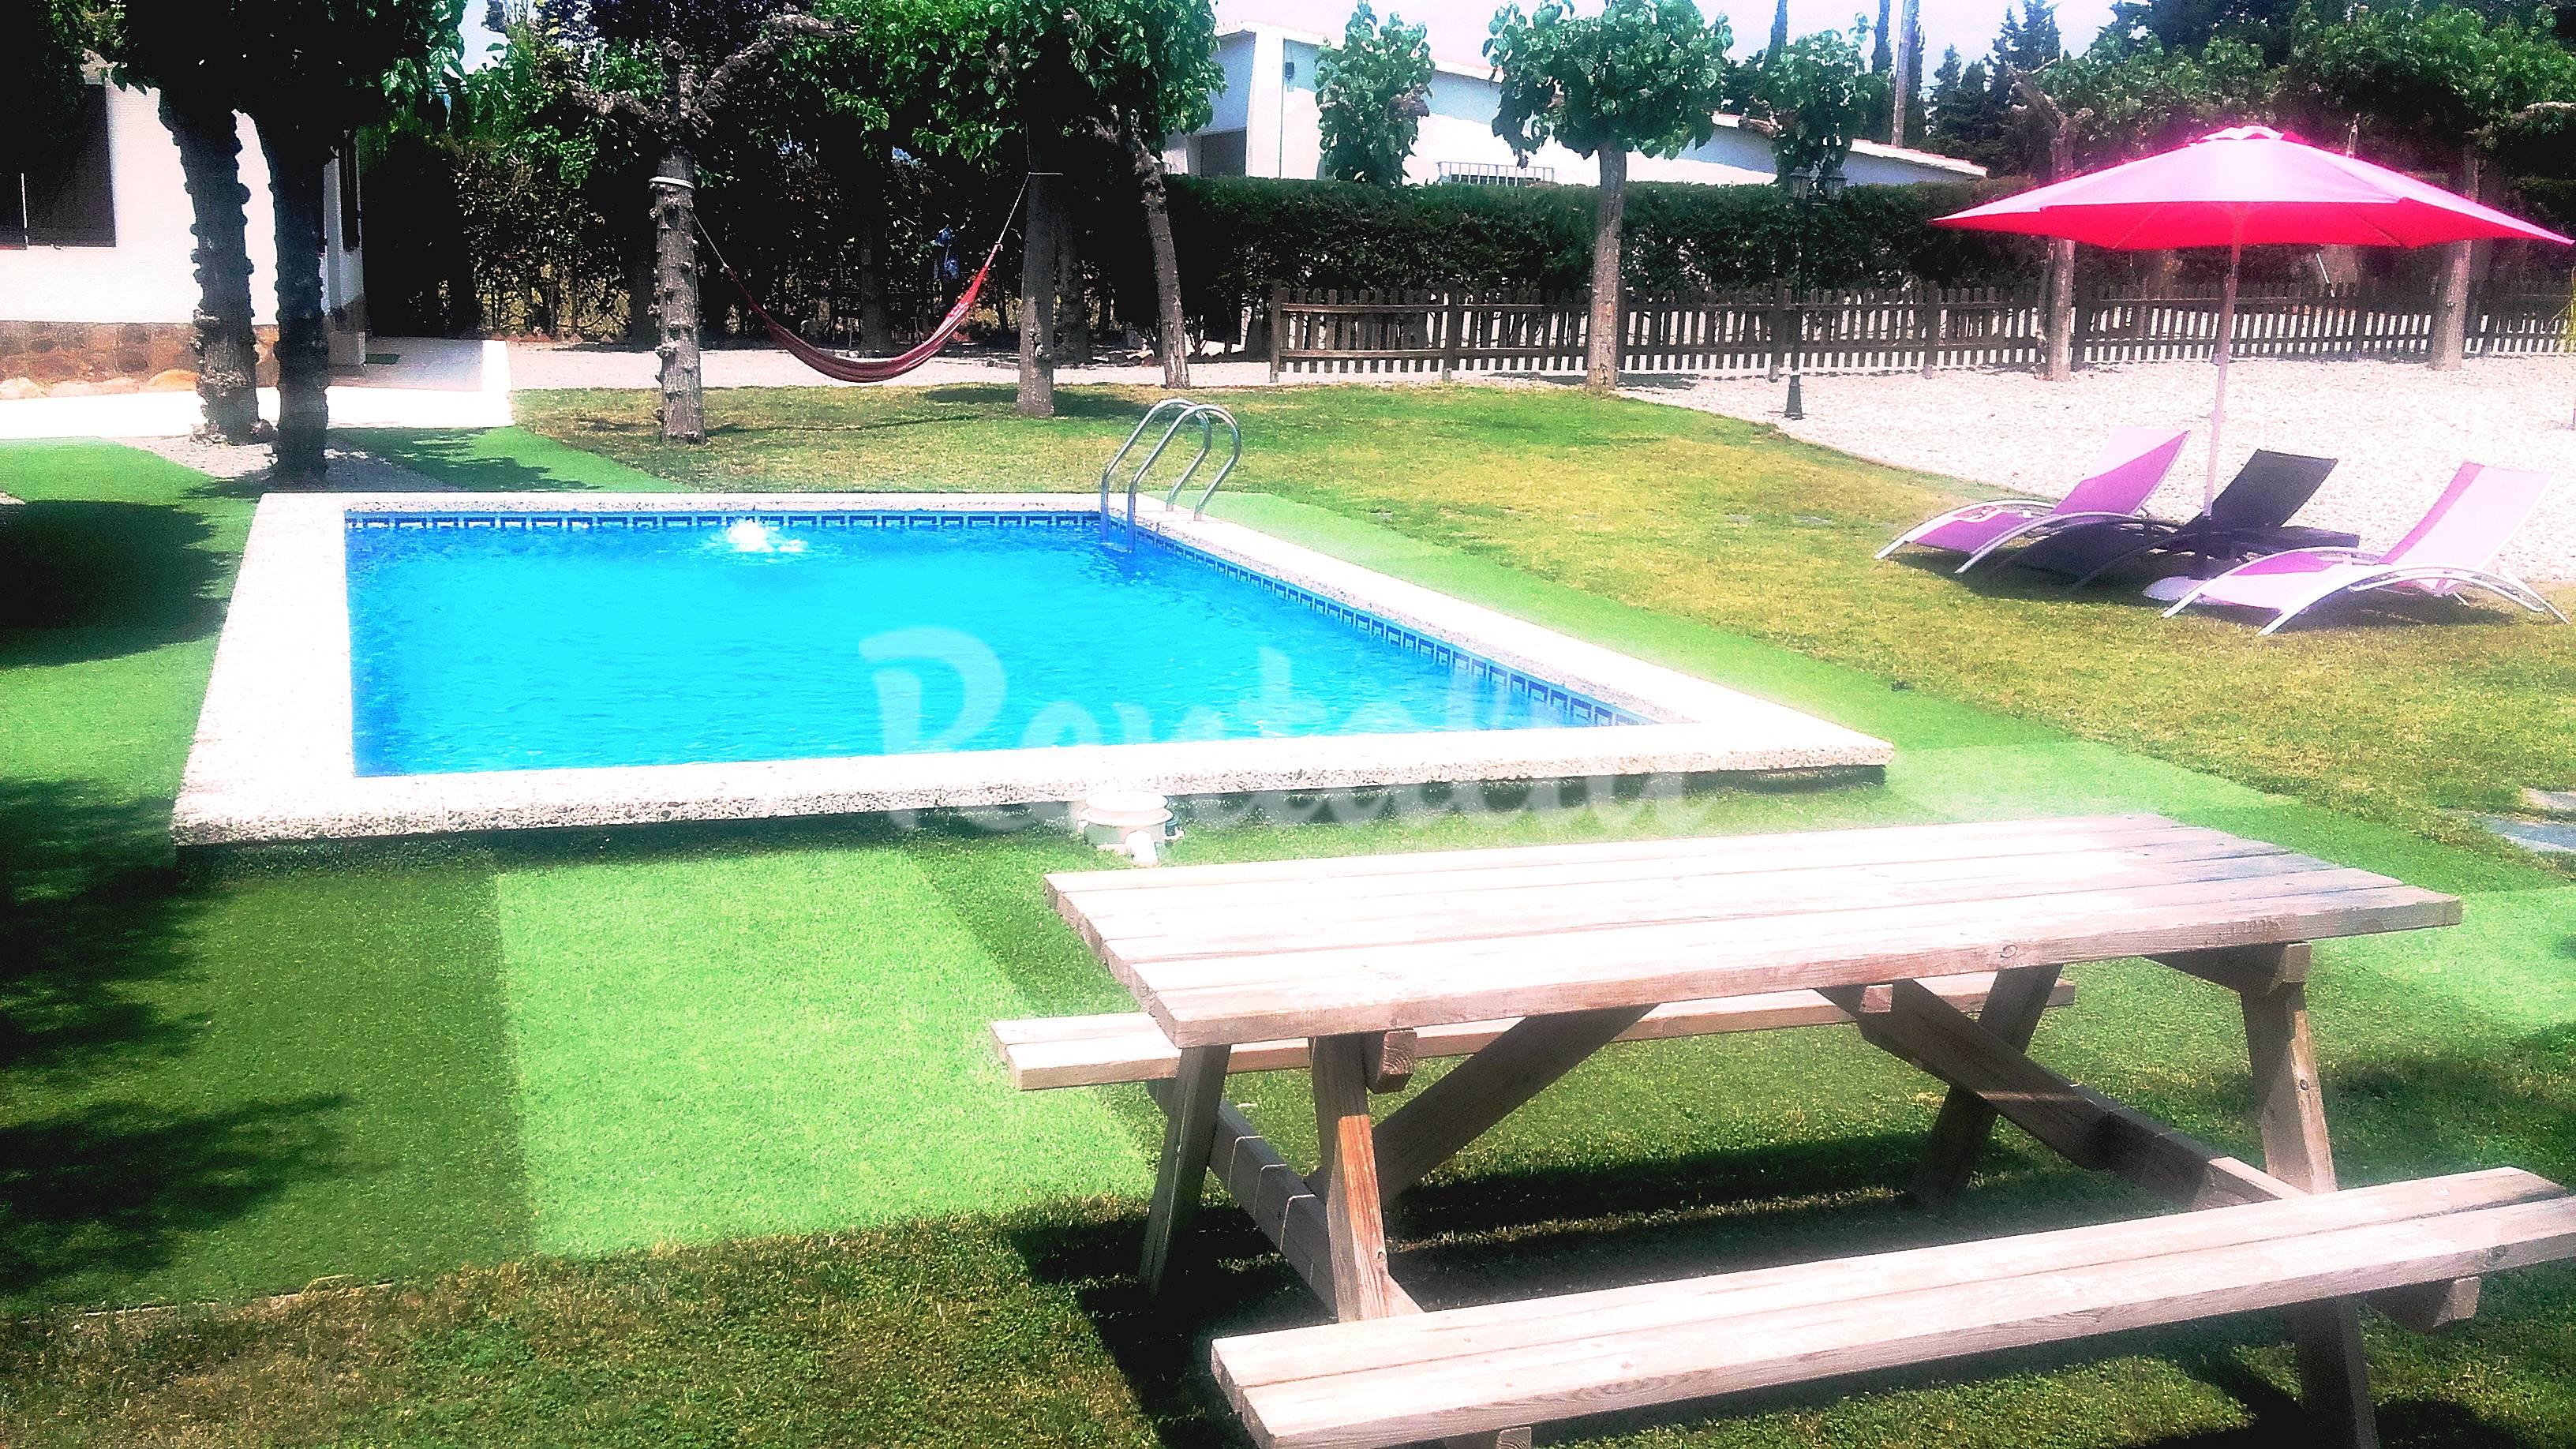 Chalet con piscina 12 pers cerca de port aventura for Piscina cambrils